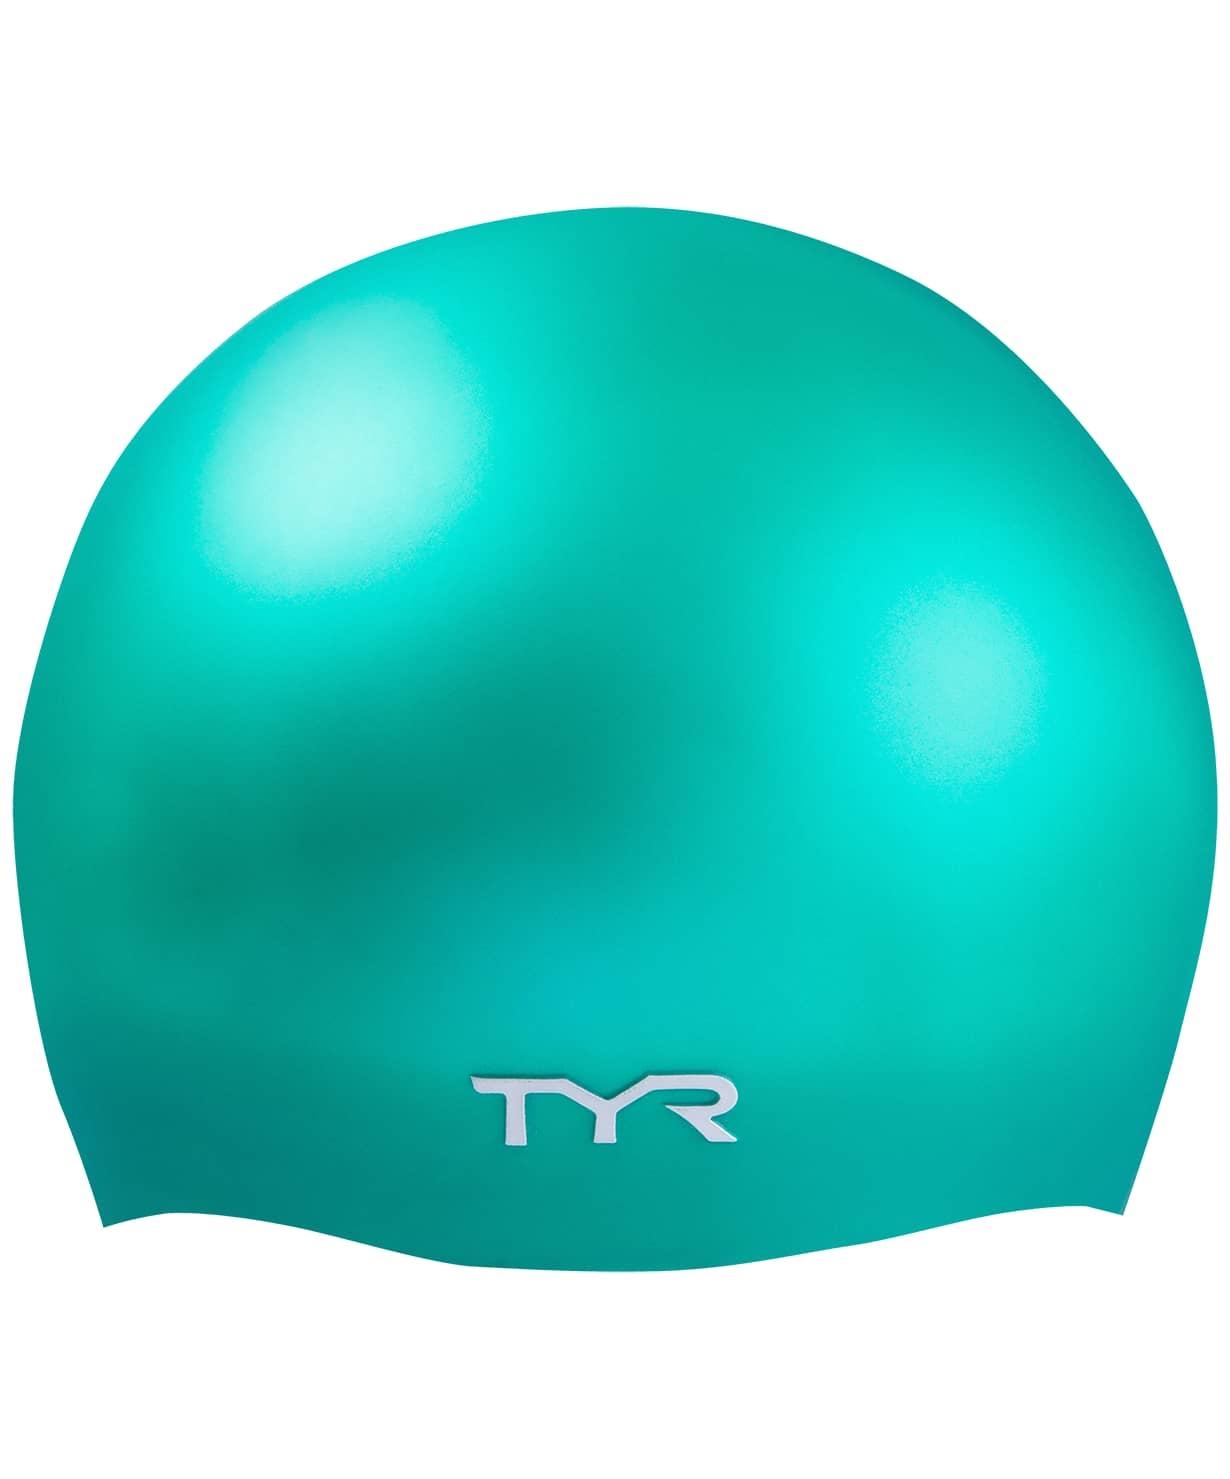 Шапочка для плавания TYR Wrinkle-Free Silicone Cap, силикон, LCSL/310, зеленый